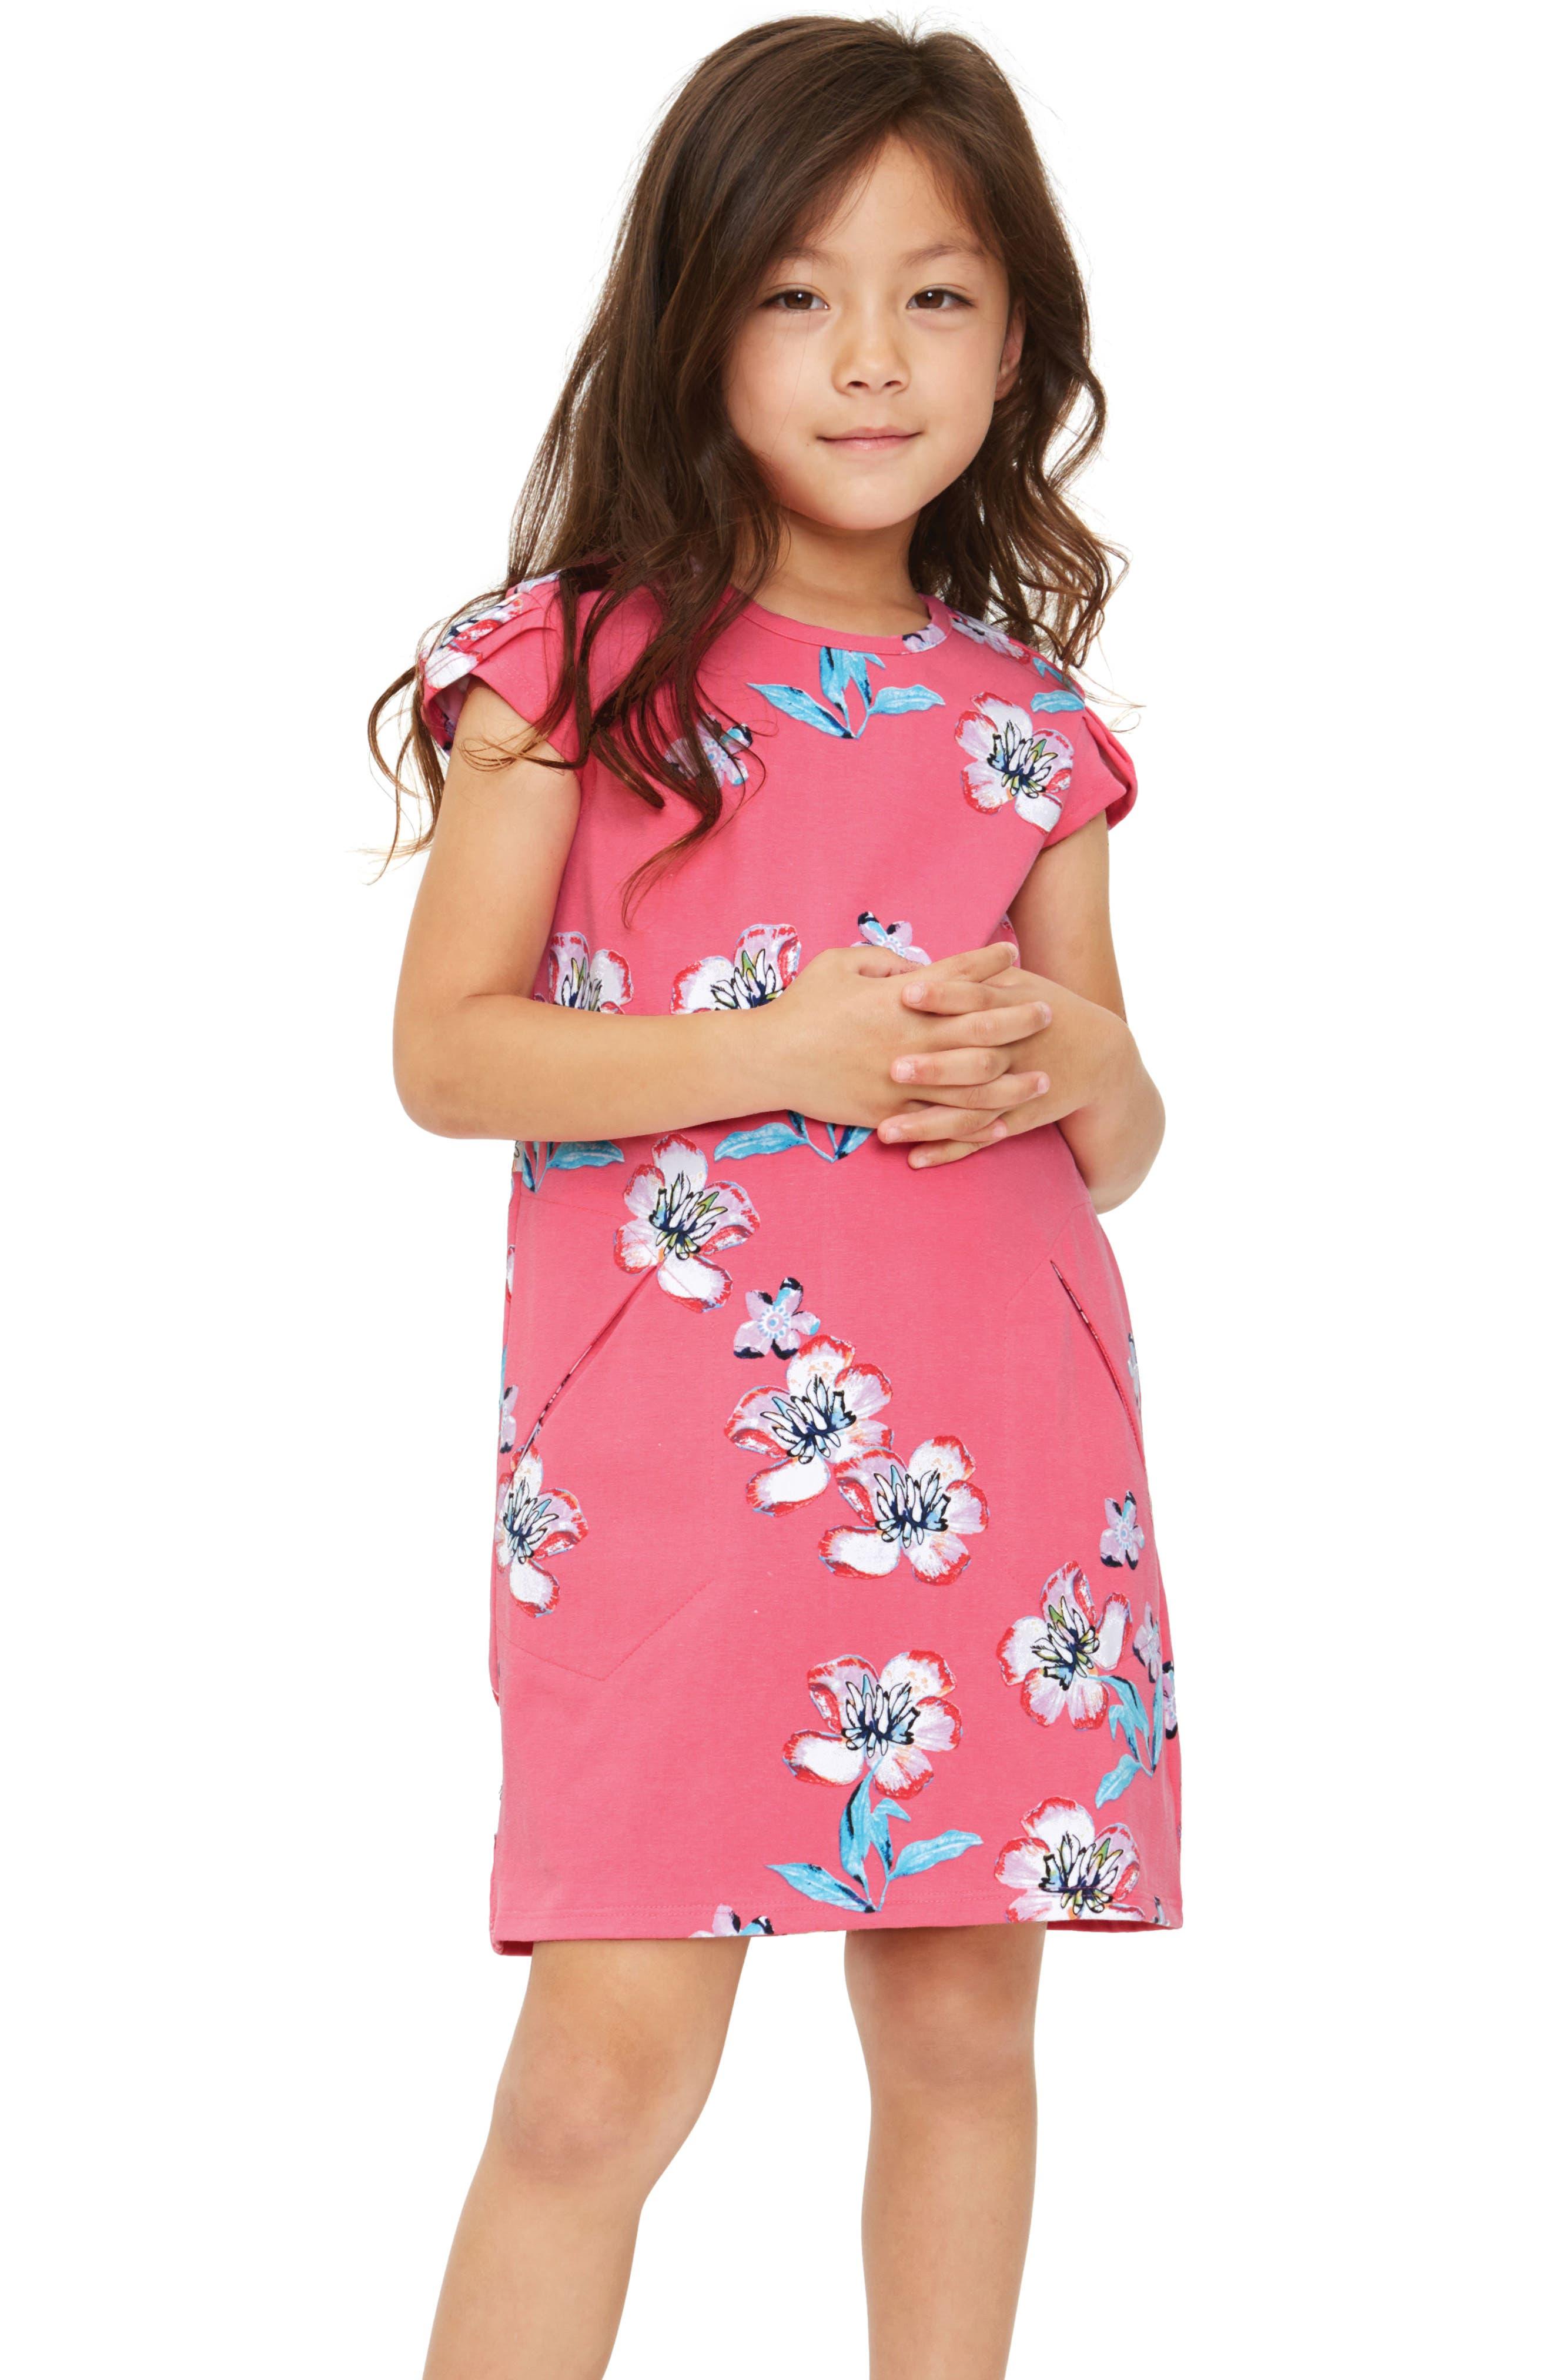 Ivy Plumeria Dress,                             Alternate thumbnail 2, color,                             673